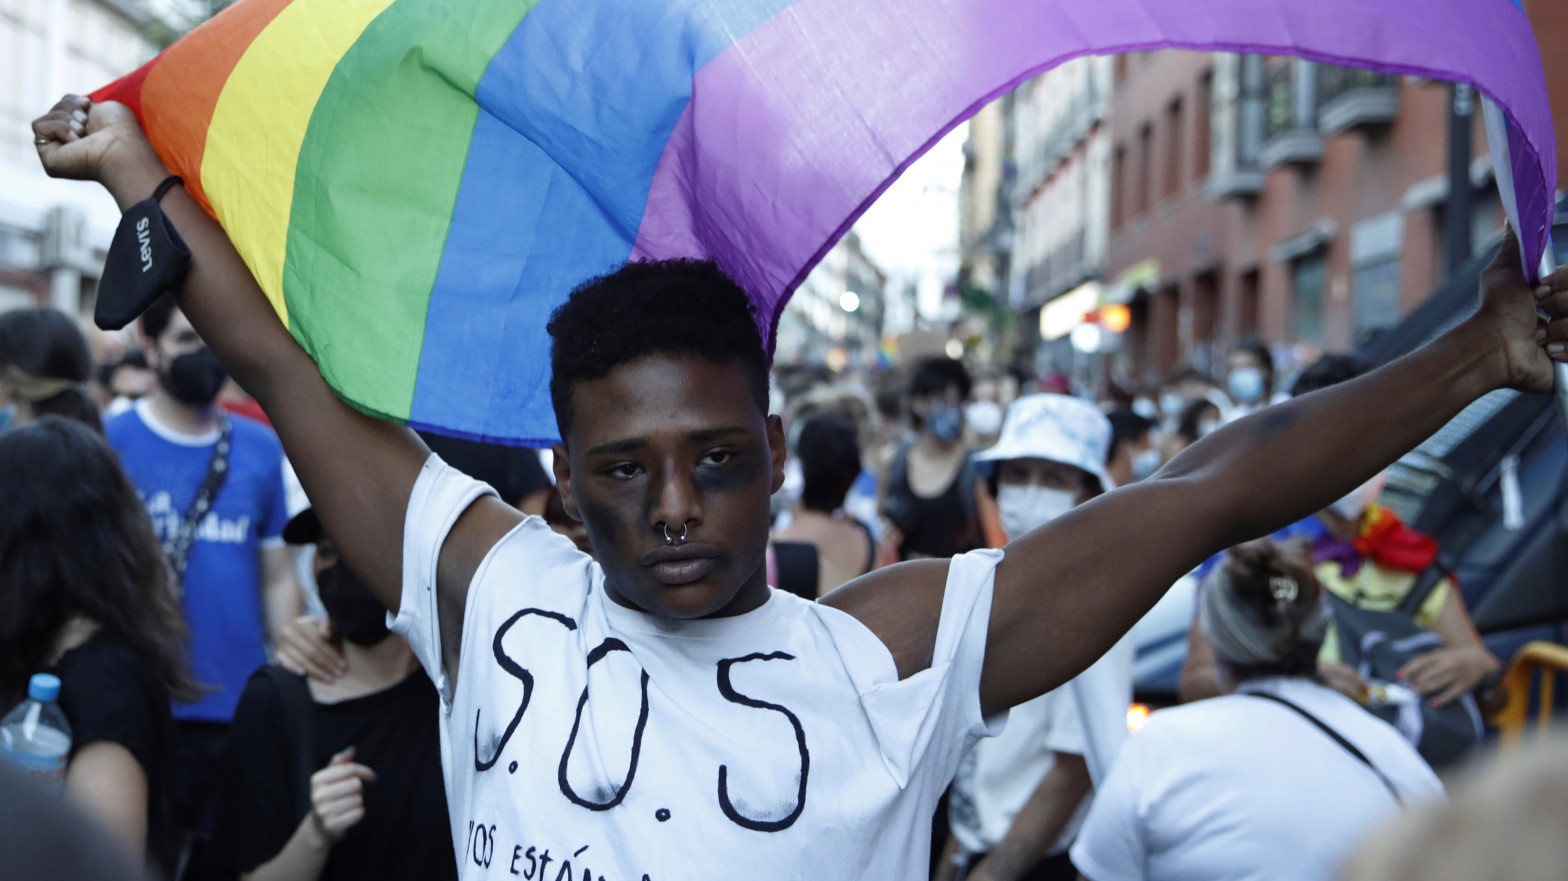 Feijóo: No me atrevo a tipificar el asesinato de Samuel como homofobia